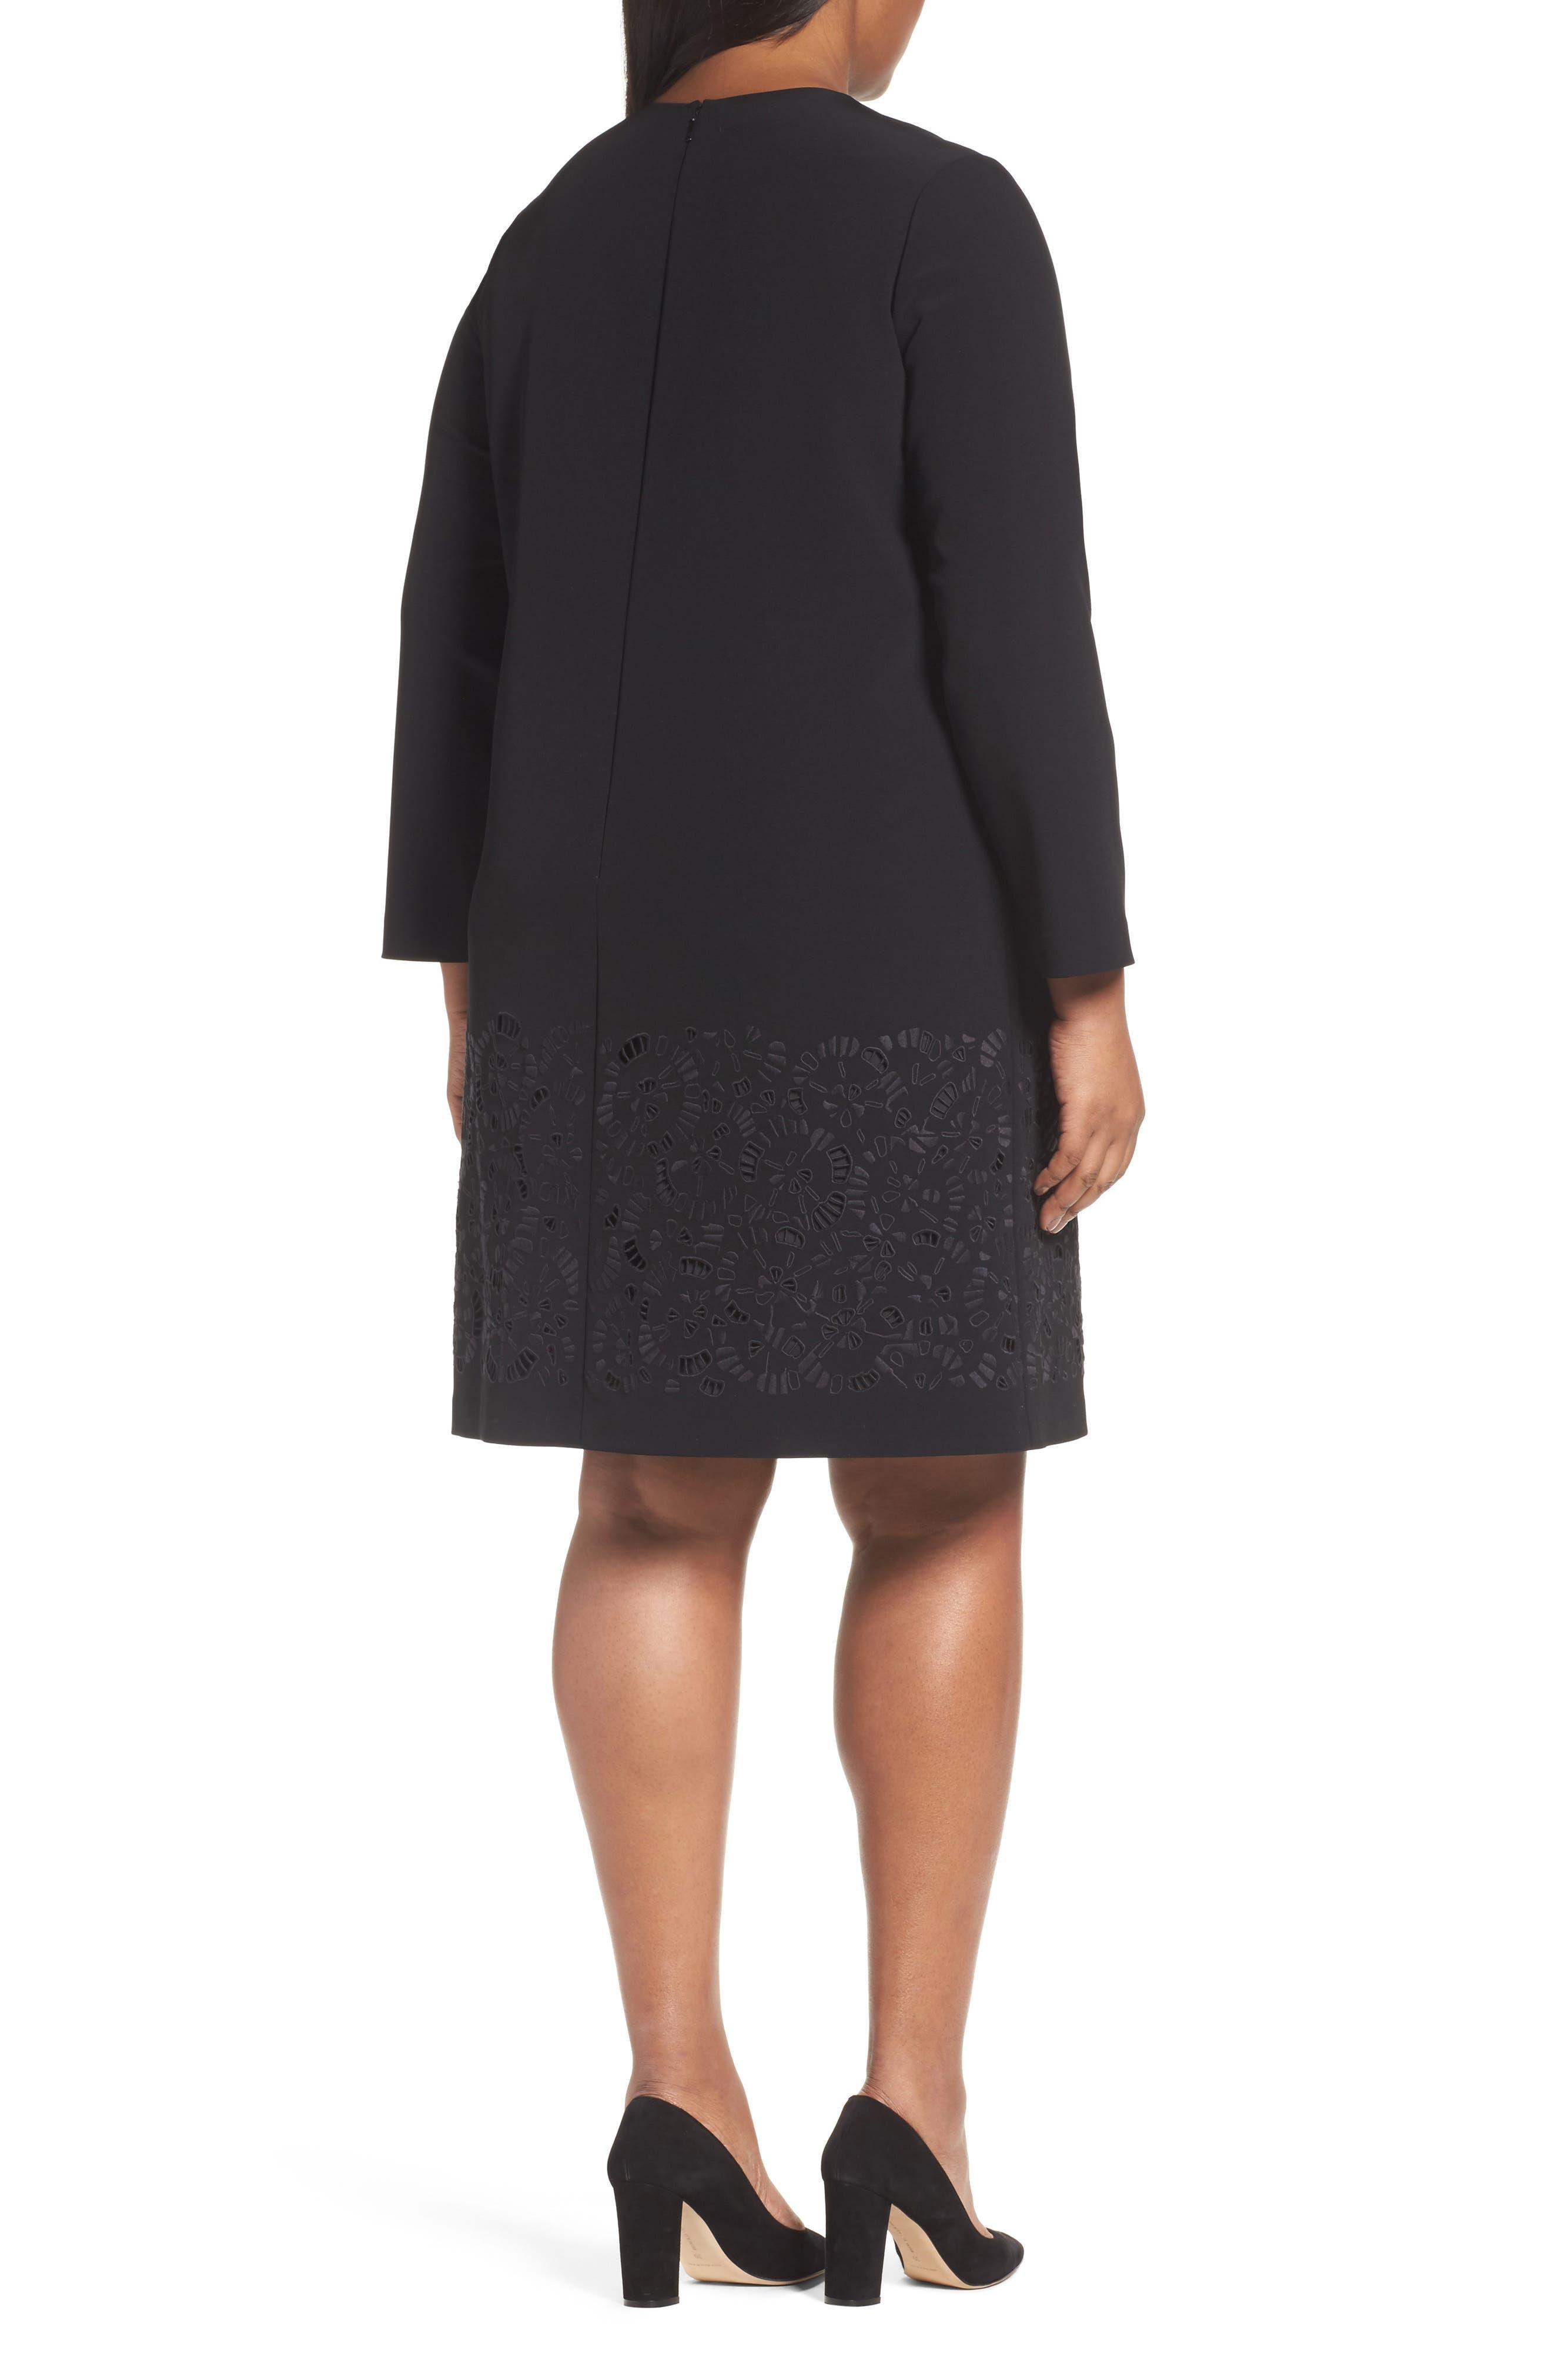 Corbin Laser Cut Dress,                             Alternate thumbnail 2, color,                             Black